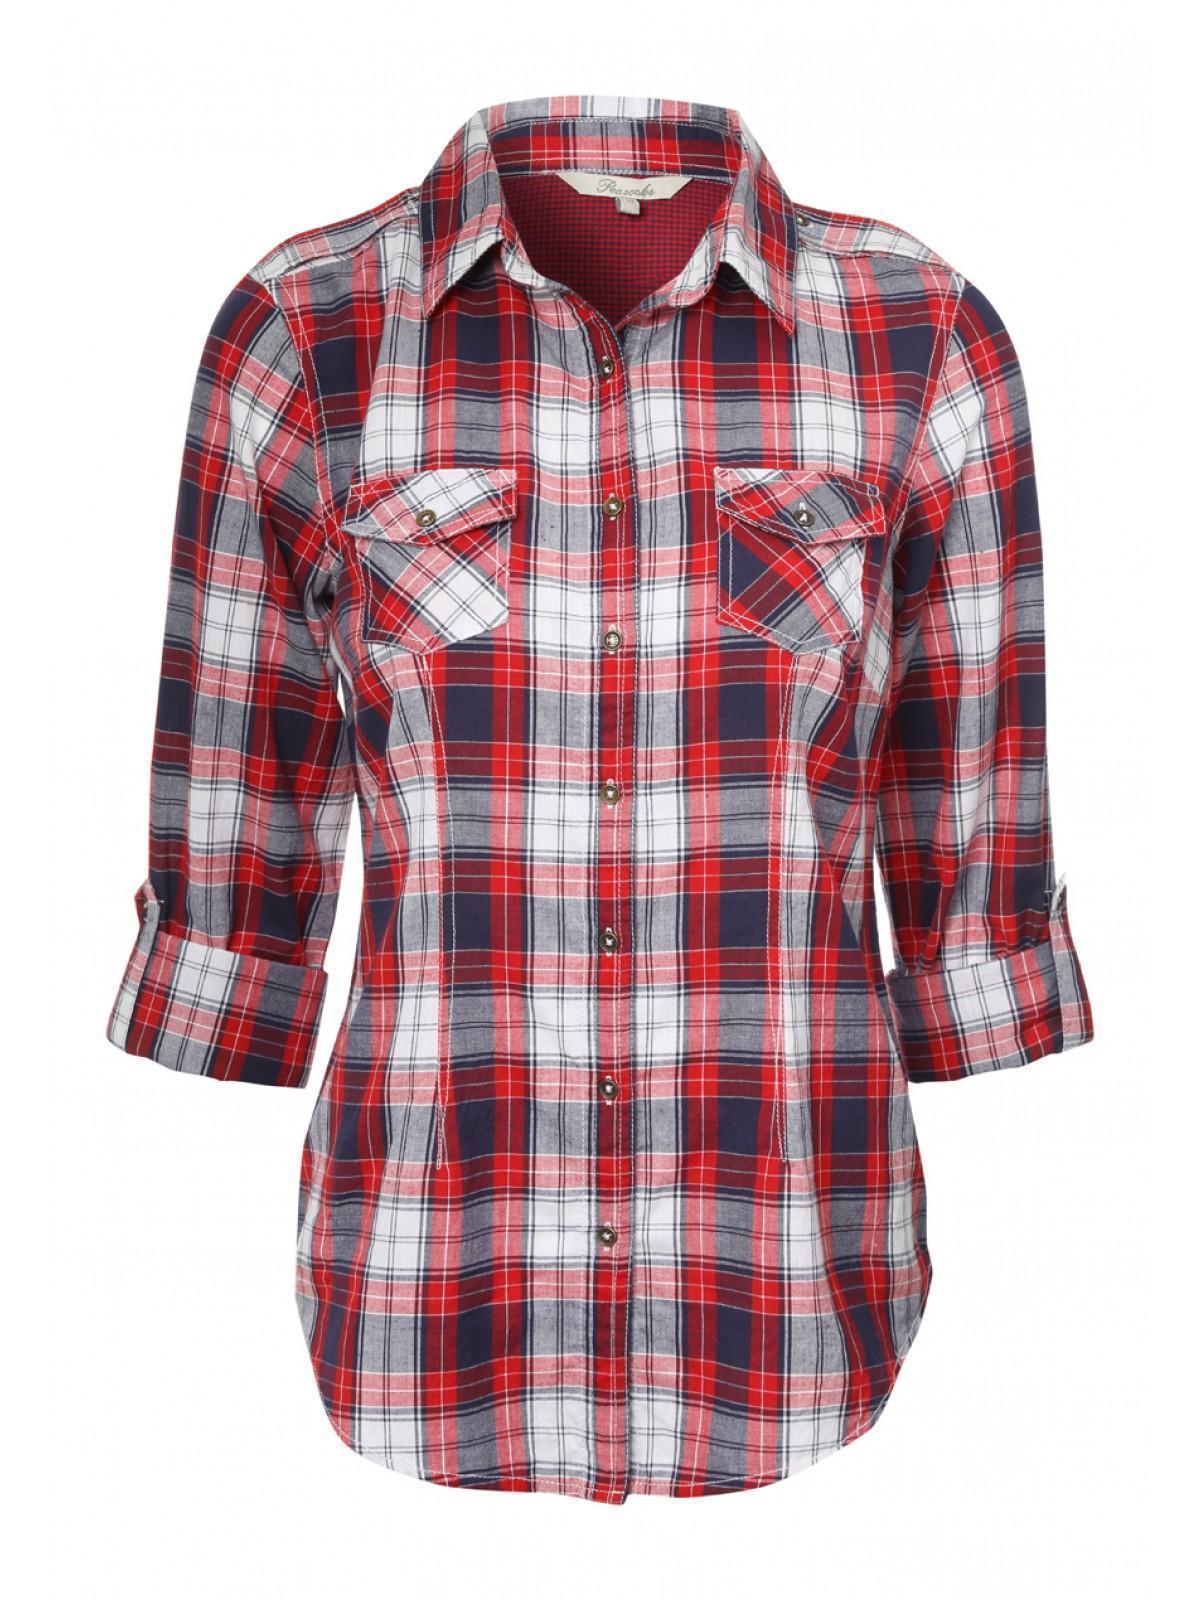 Womens Checked Shirt | Is Shirt